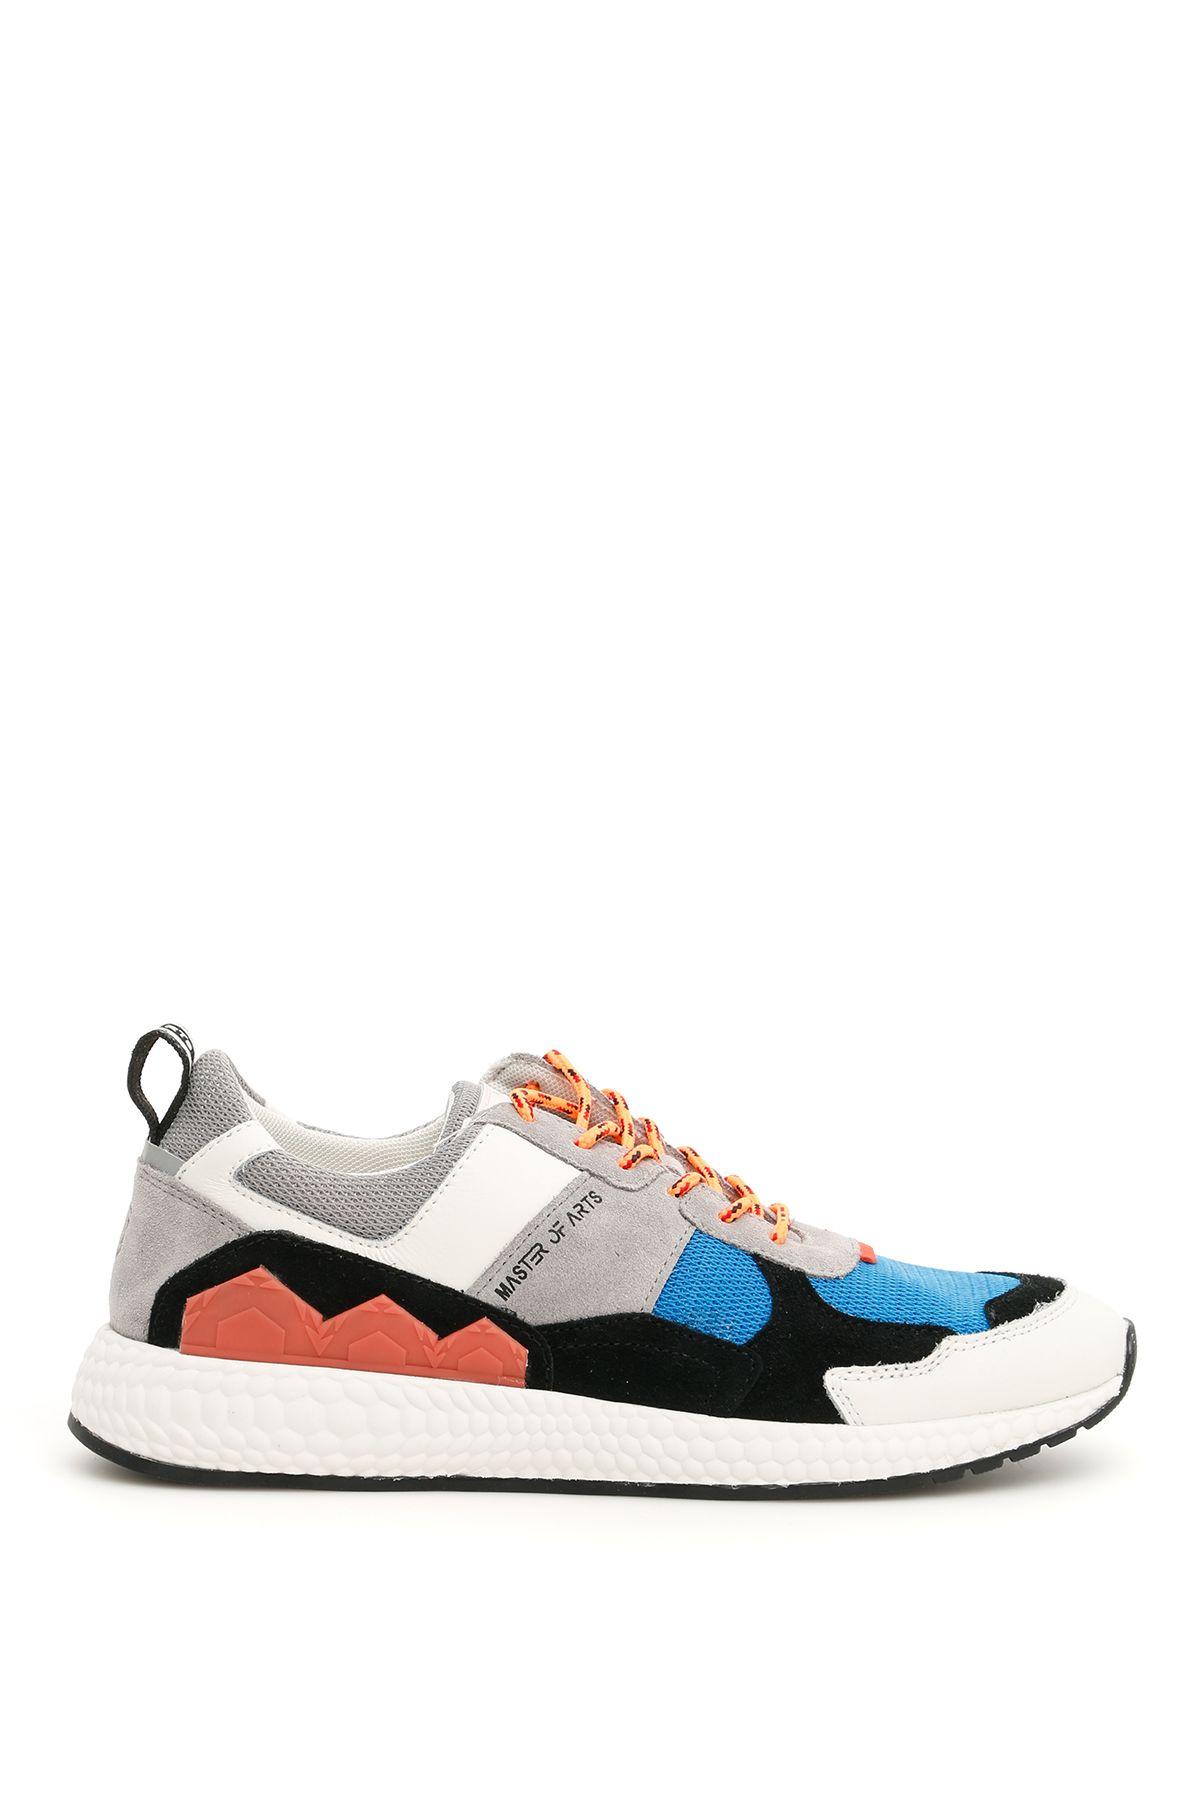 M.O.A. master of arts Futura Running Sneakers